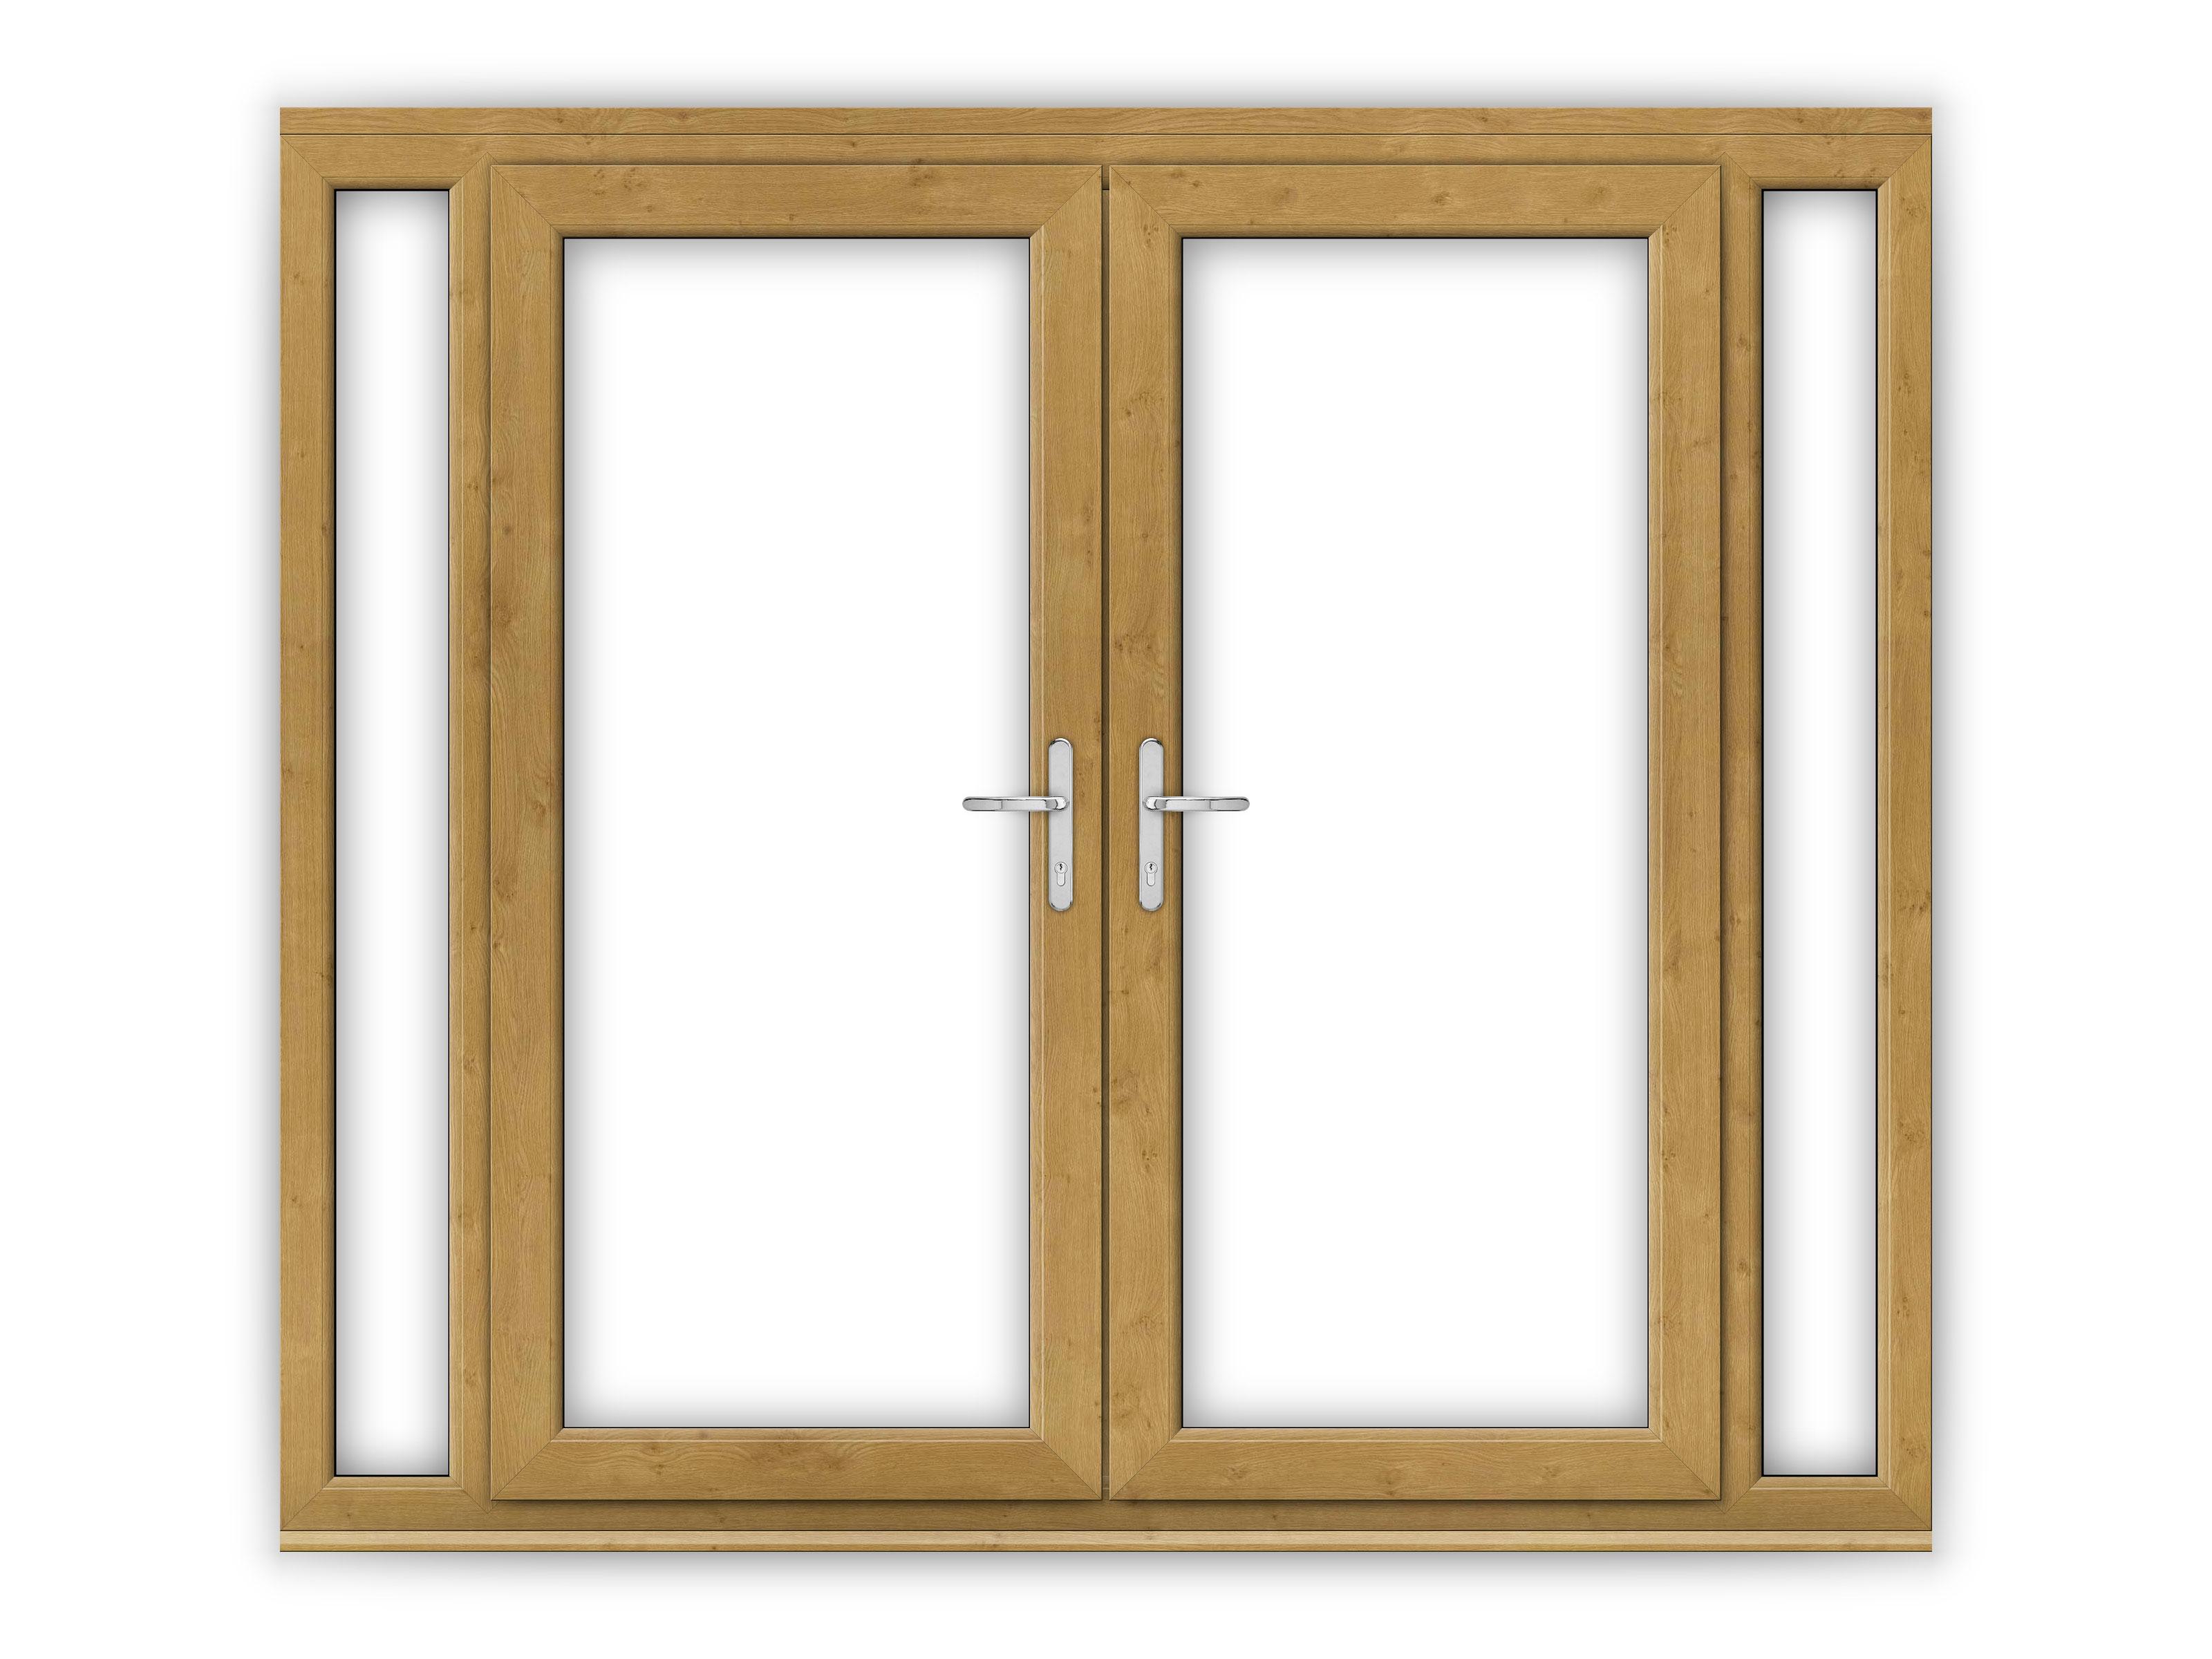 6ft irish oak upvc french doors with narrow side panels for Upvc french doors northern ireland